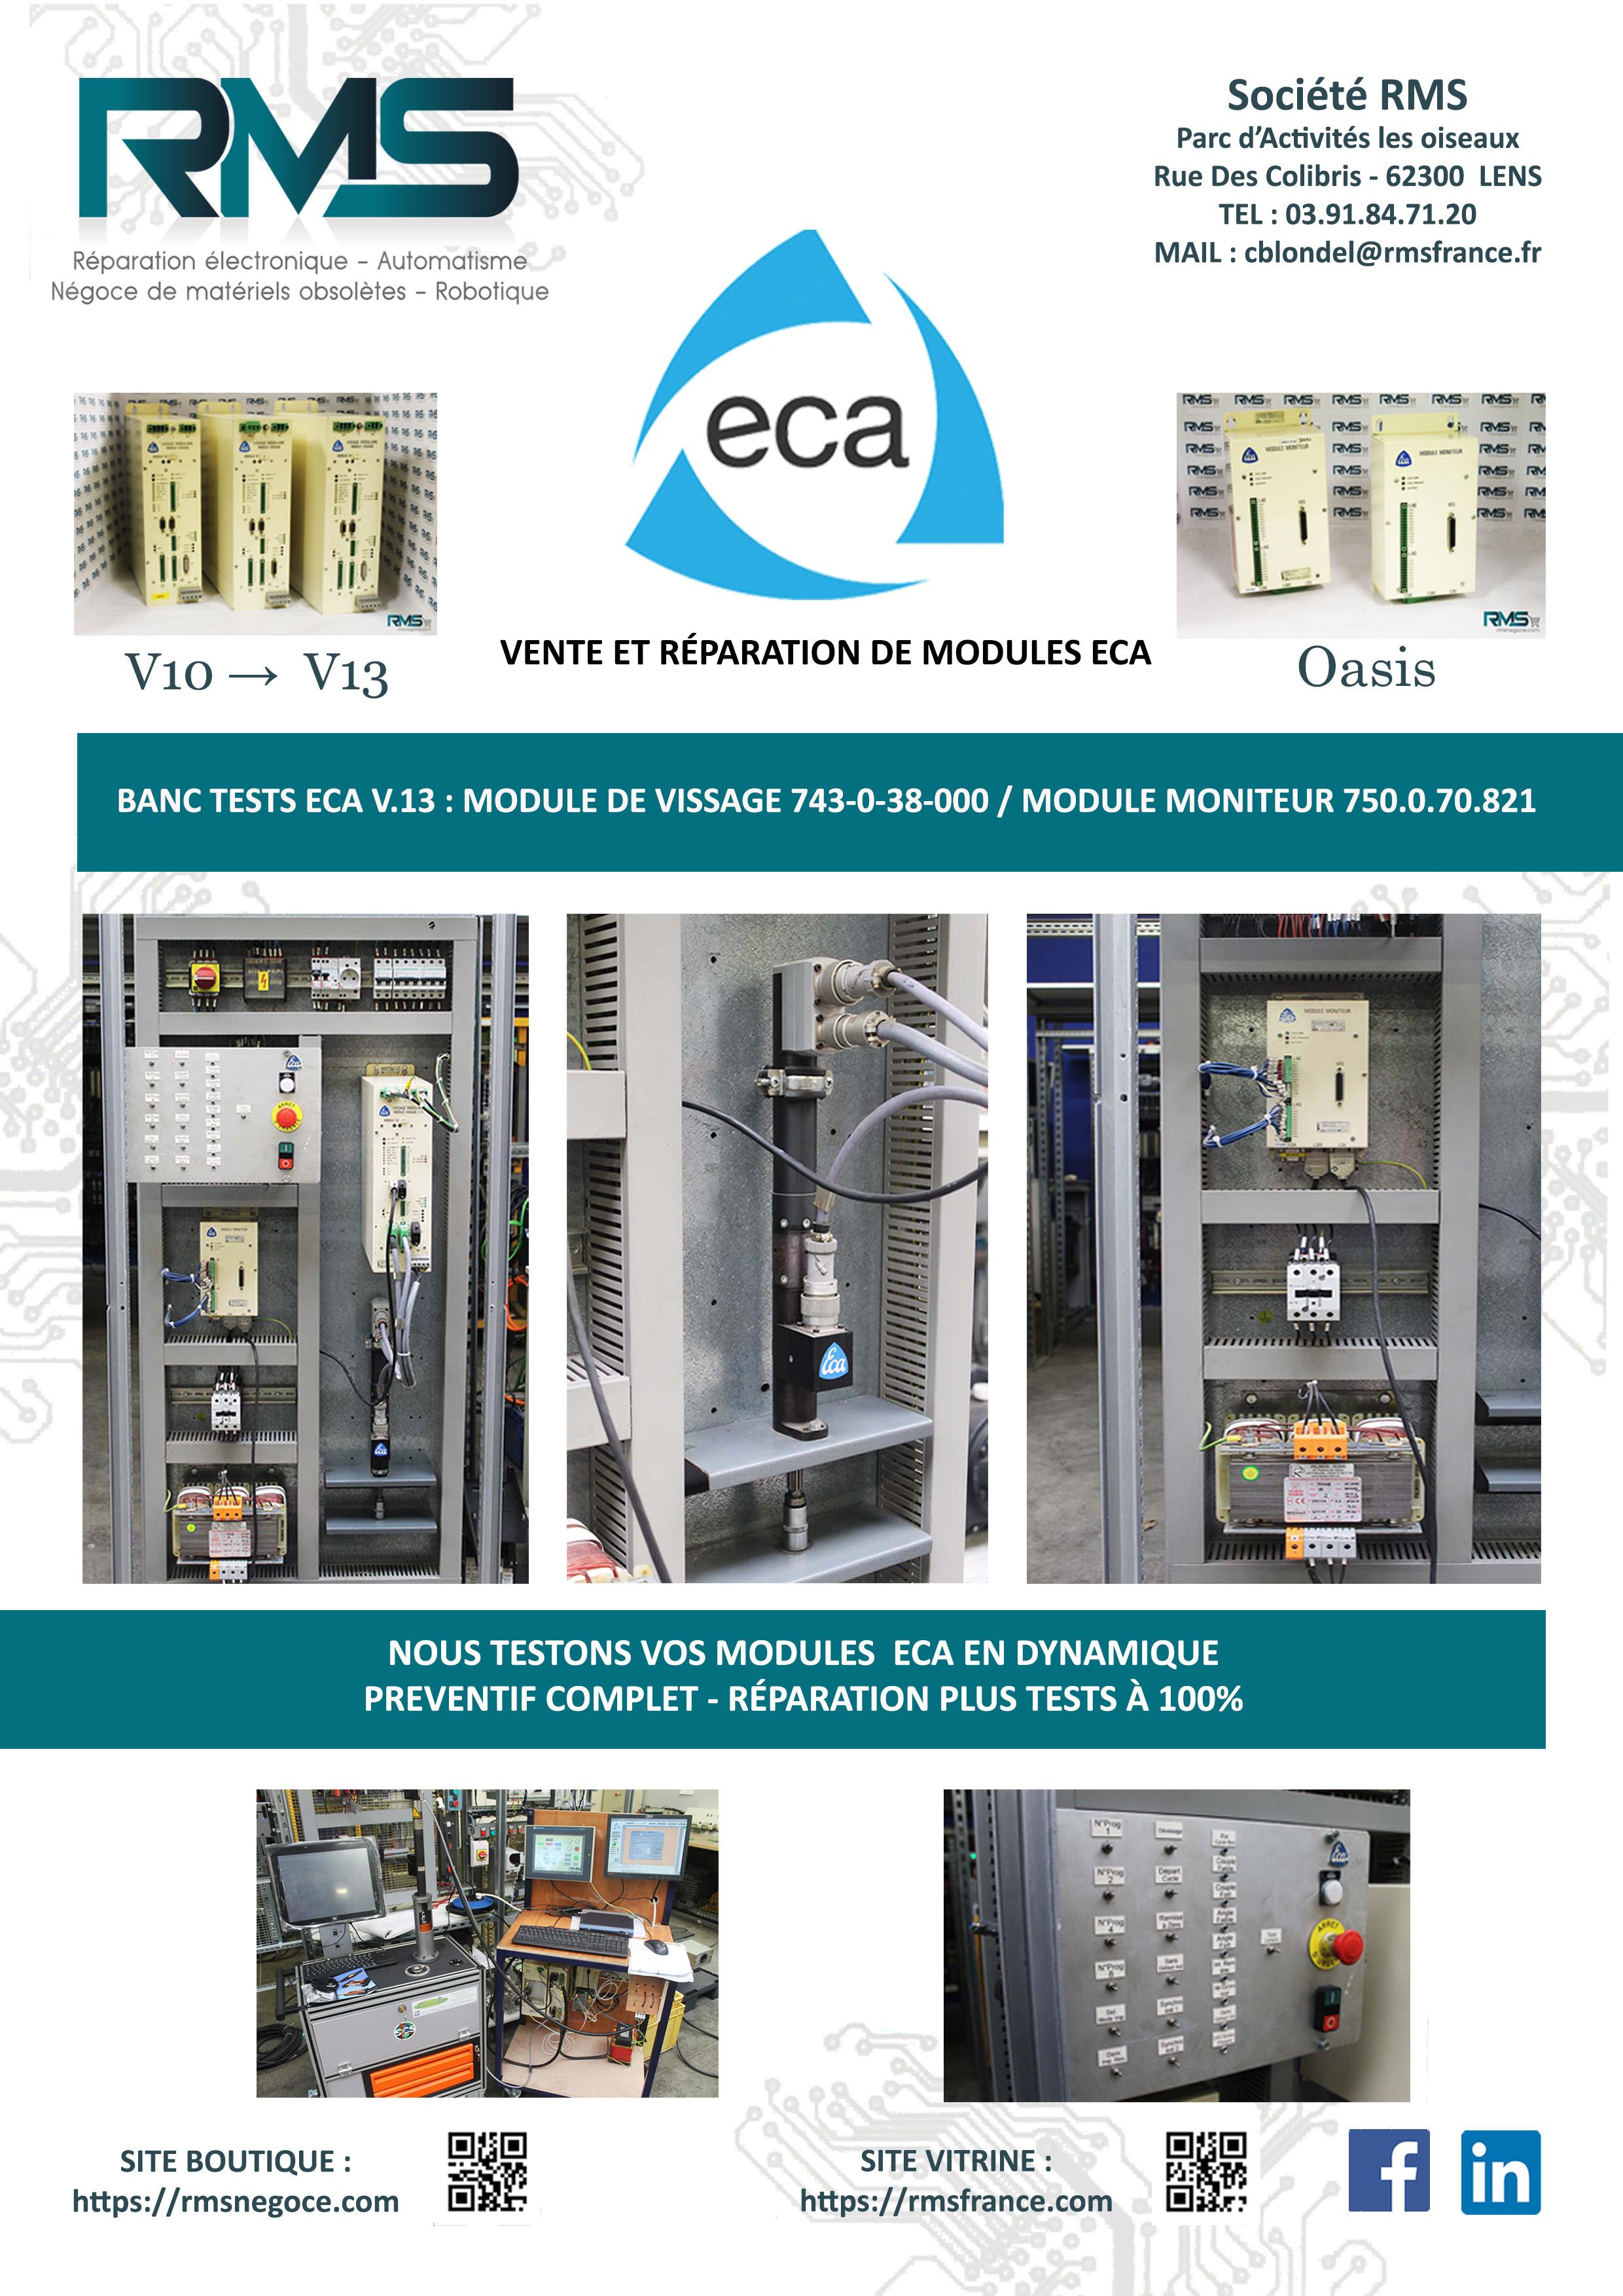 ECA - RMSNEGOCE - MODULE VISSAGE ECA - MODULE BROCHE ECA - RMSNEGOCE